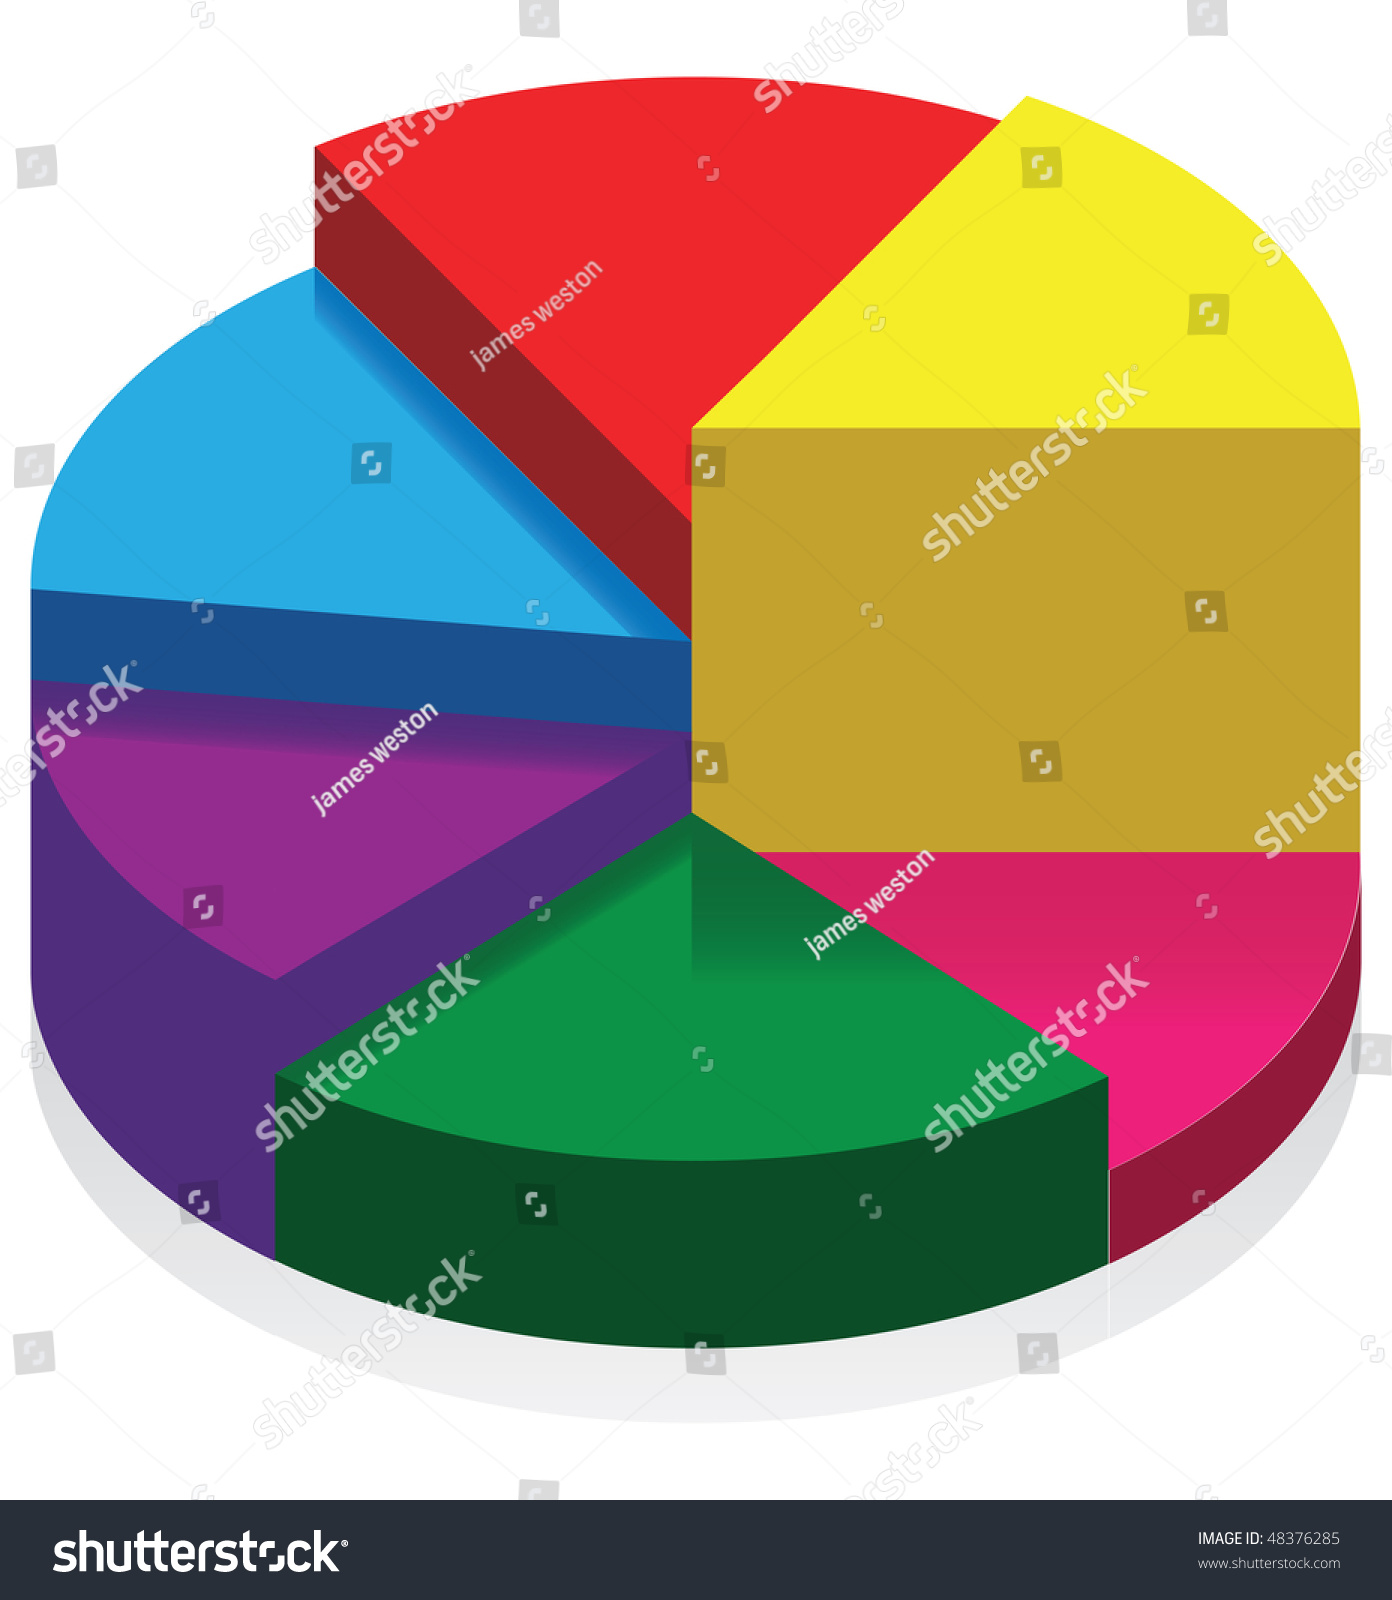 3d pie chart stock vector 48376285 shutterstock 3d pie chart geenschuldenfo Image collections